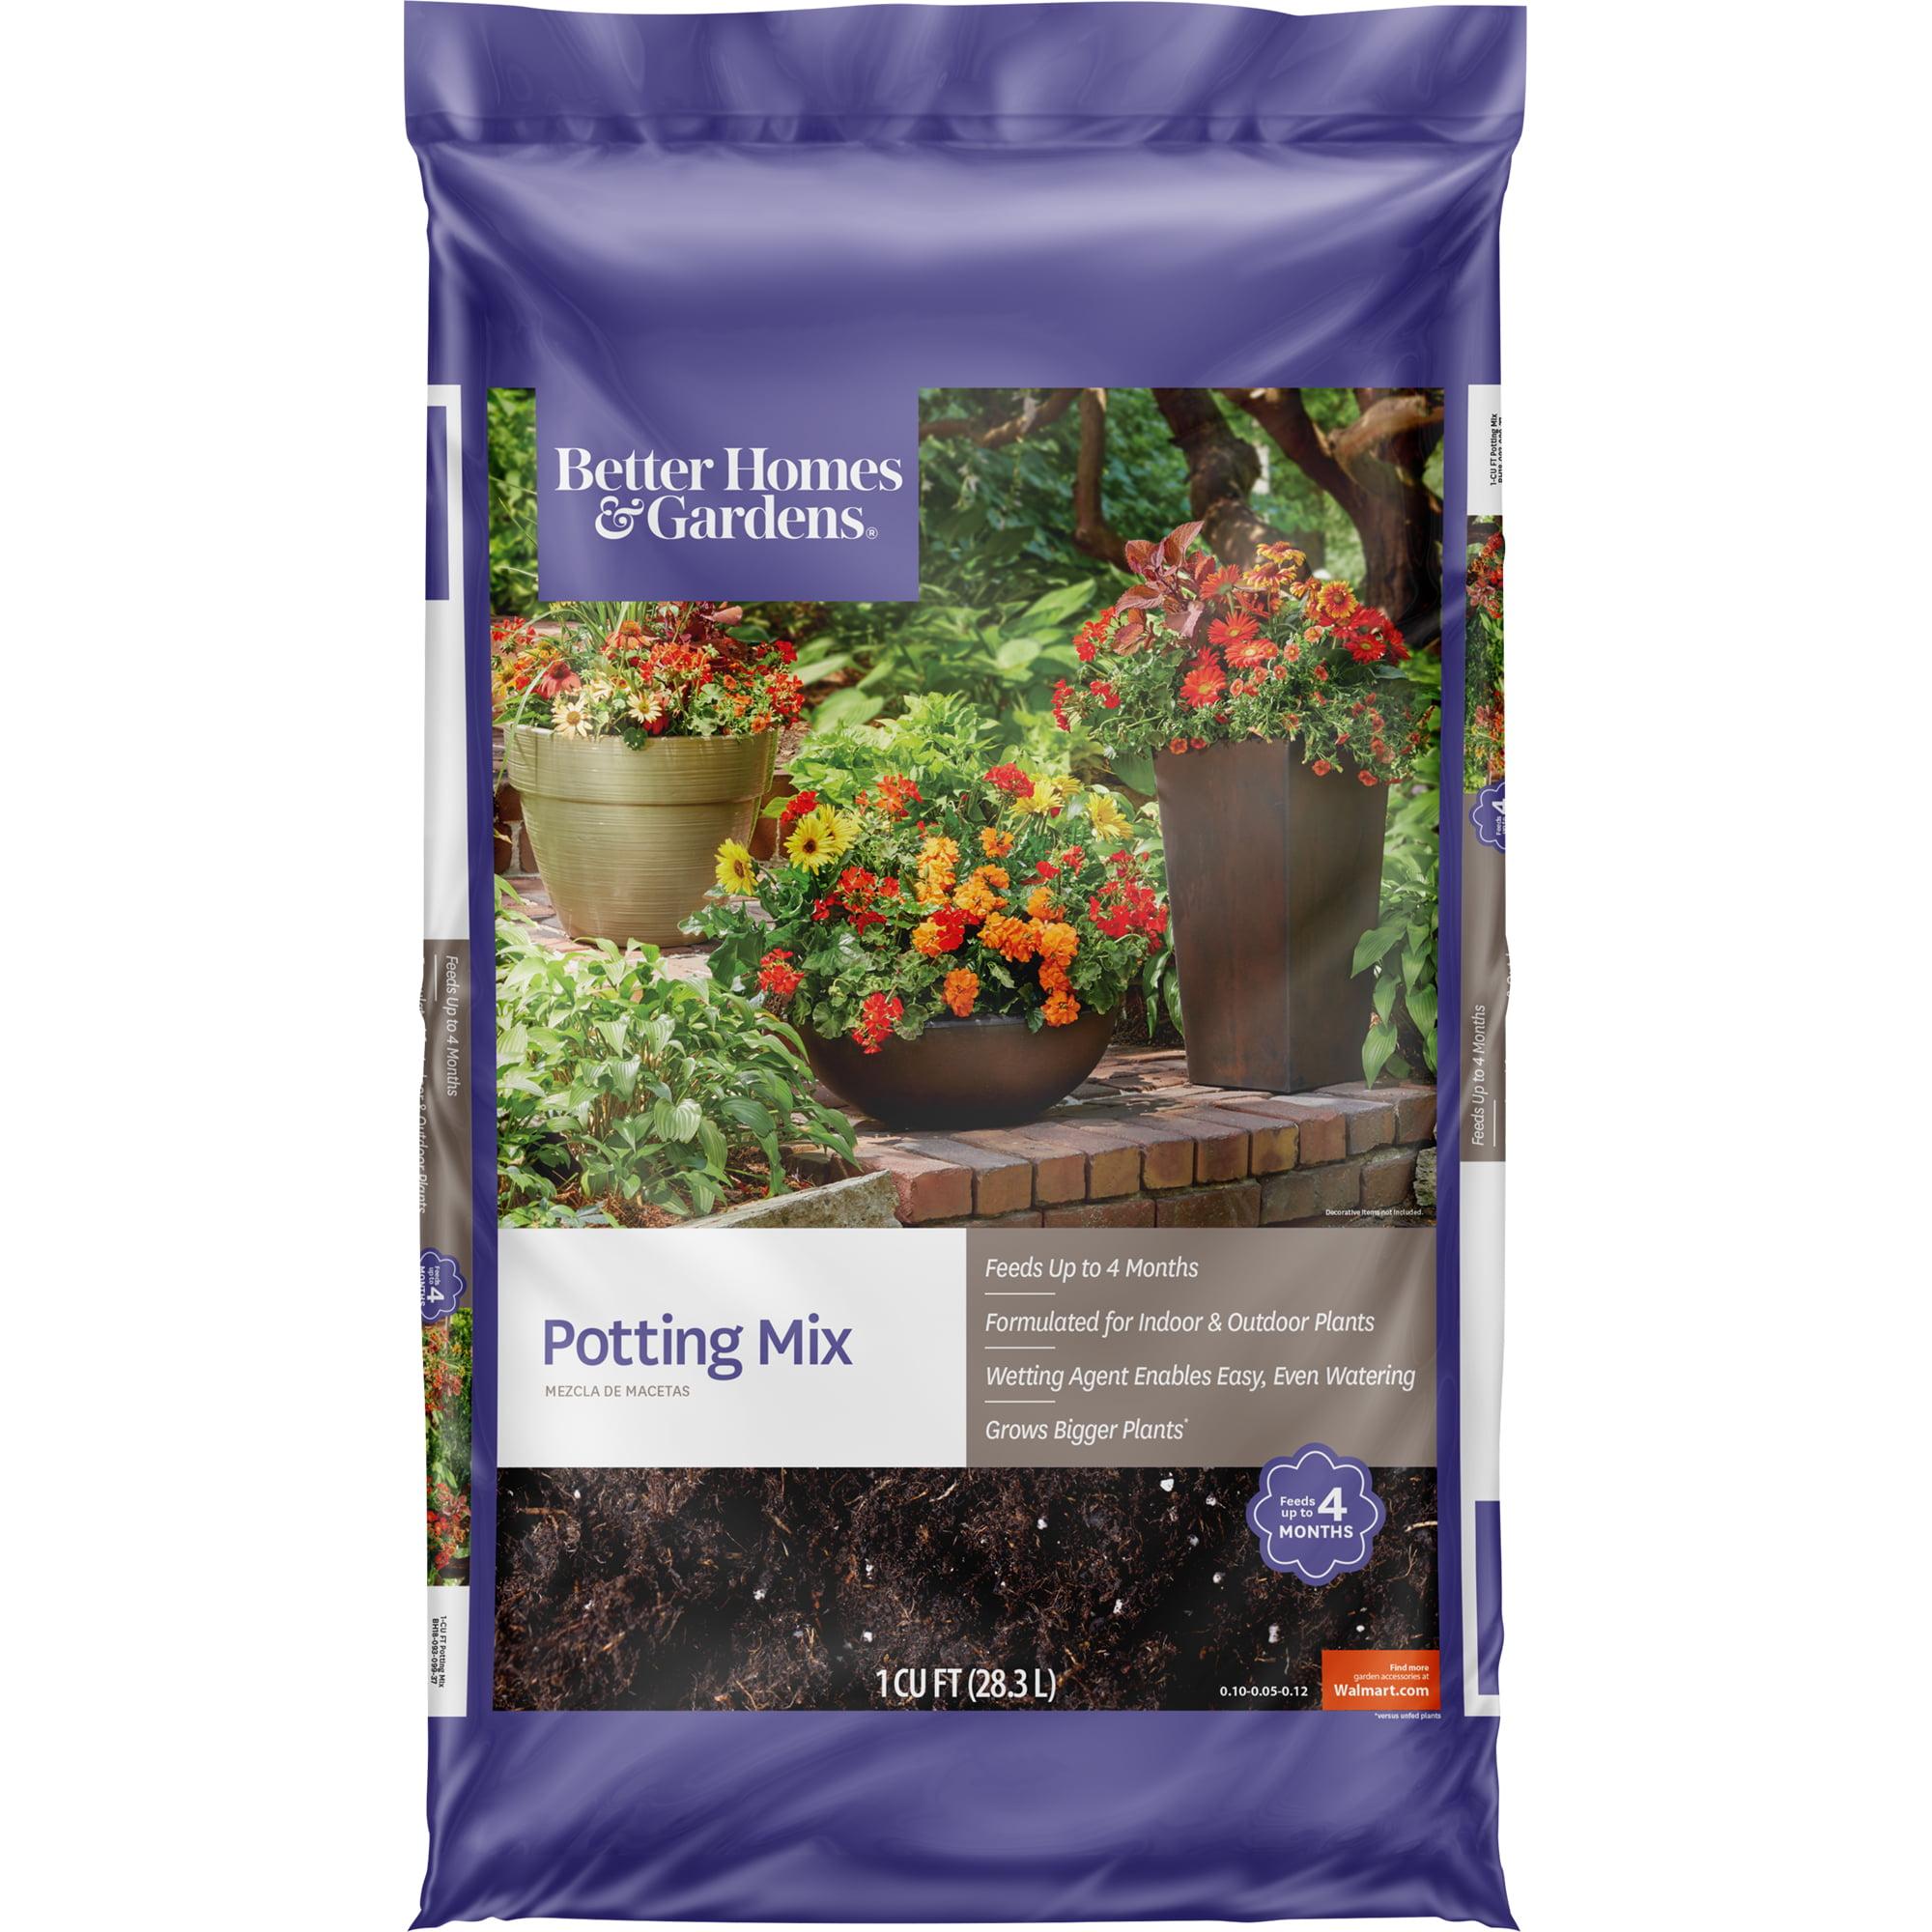 Better Homes & Gardens Potting Mix Planter Soil, 1 Cubic Foot